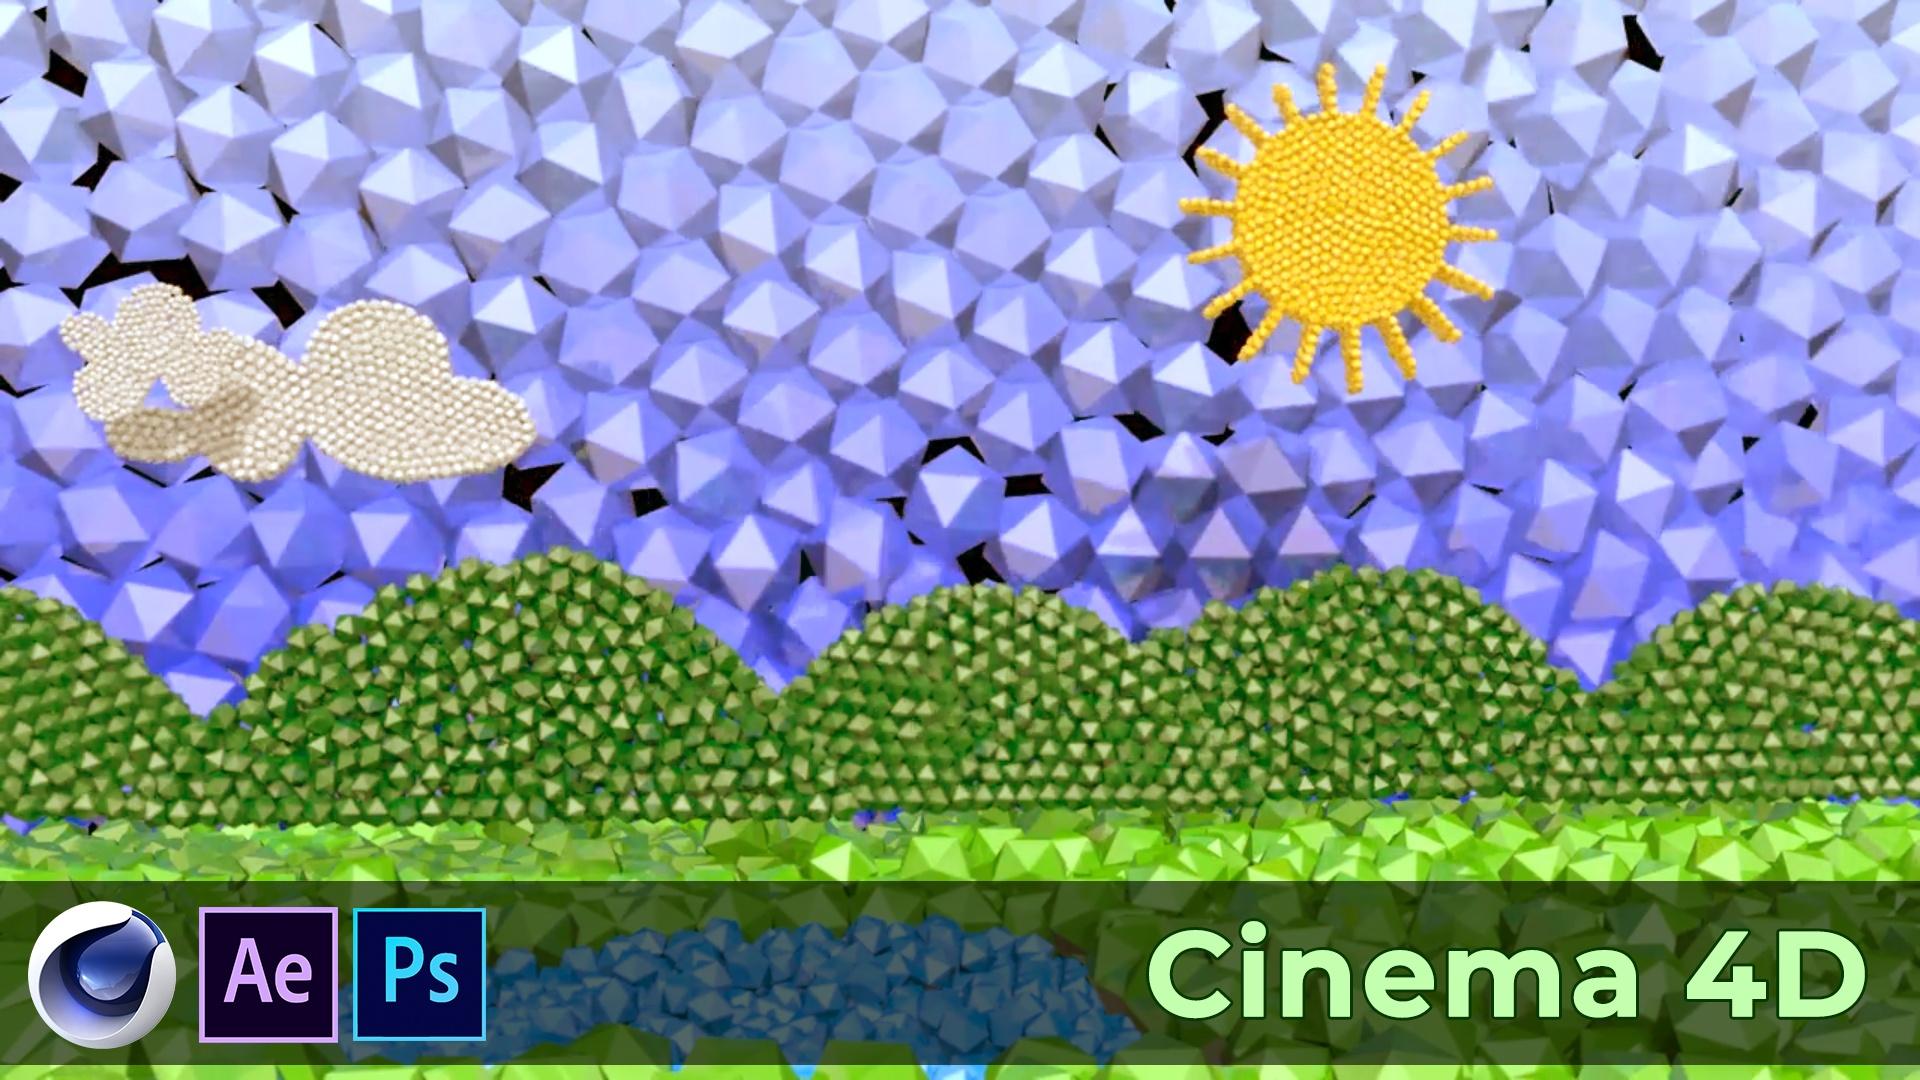 02. Cinema 4D